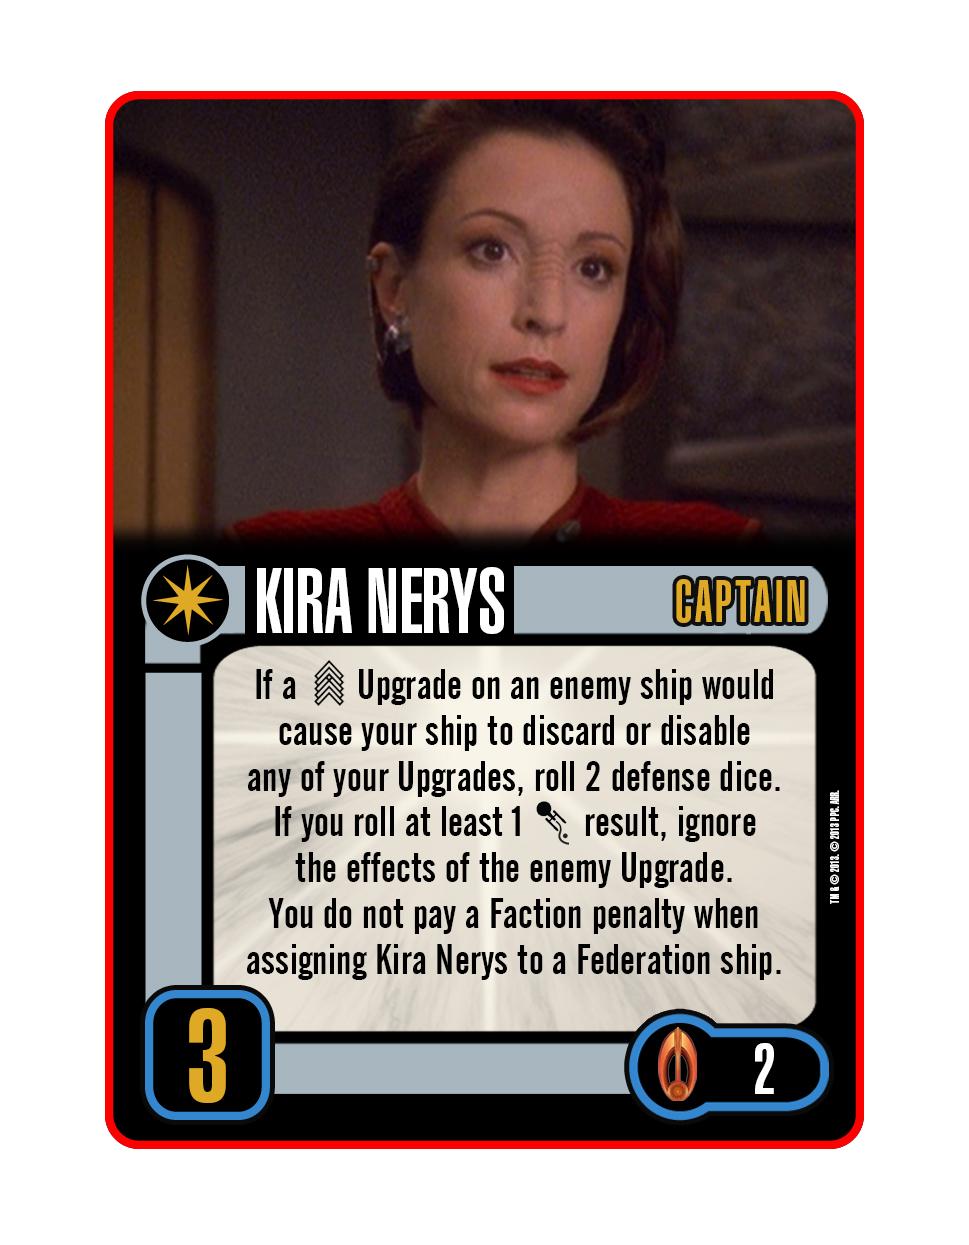 Captain - Kira Nerys